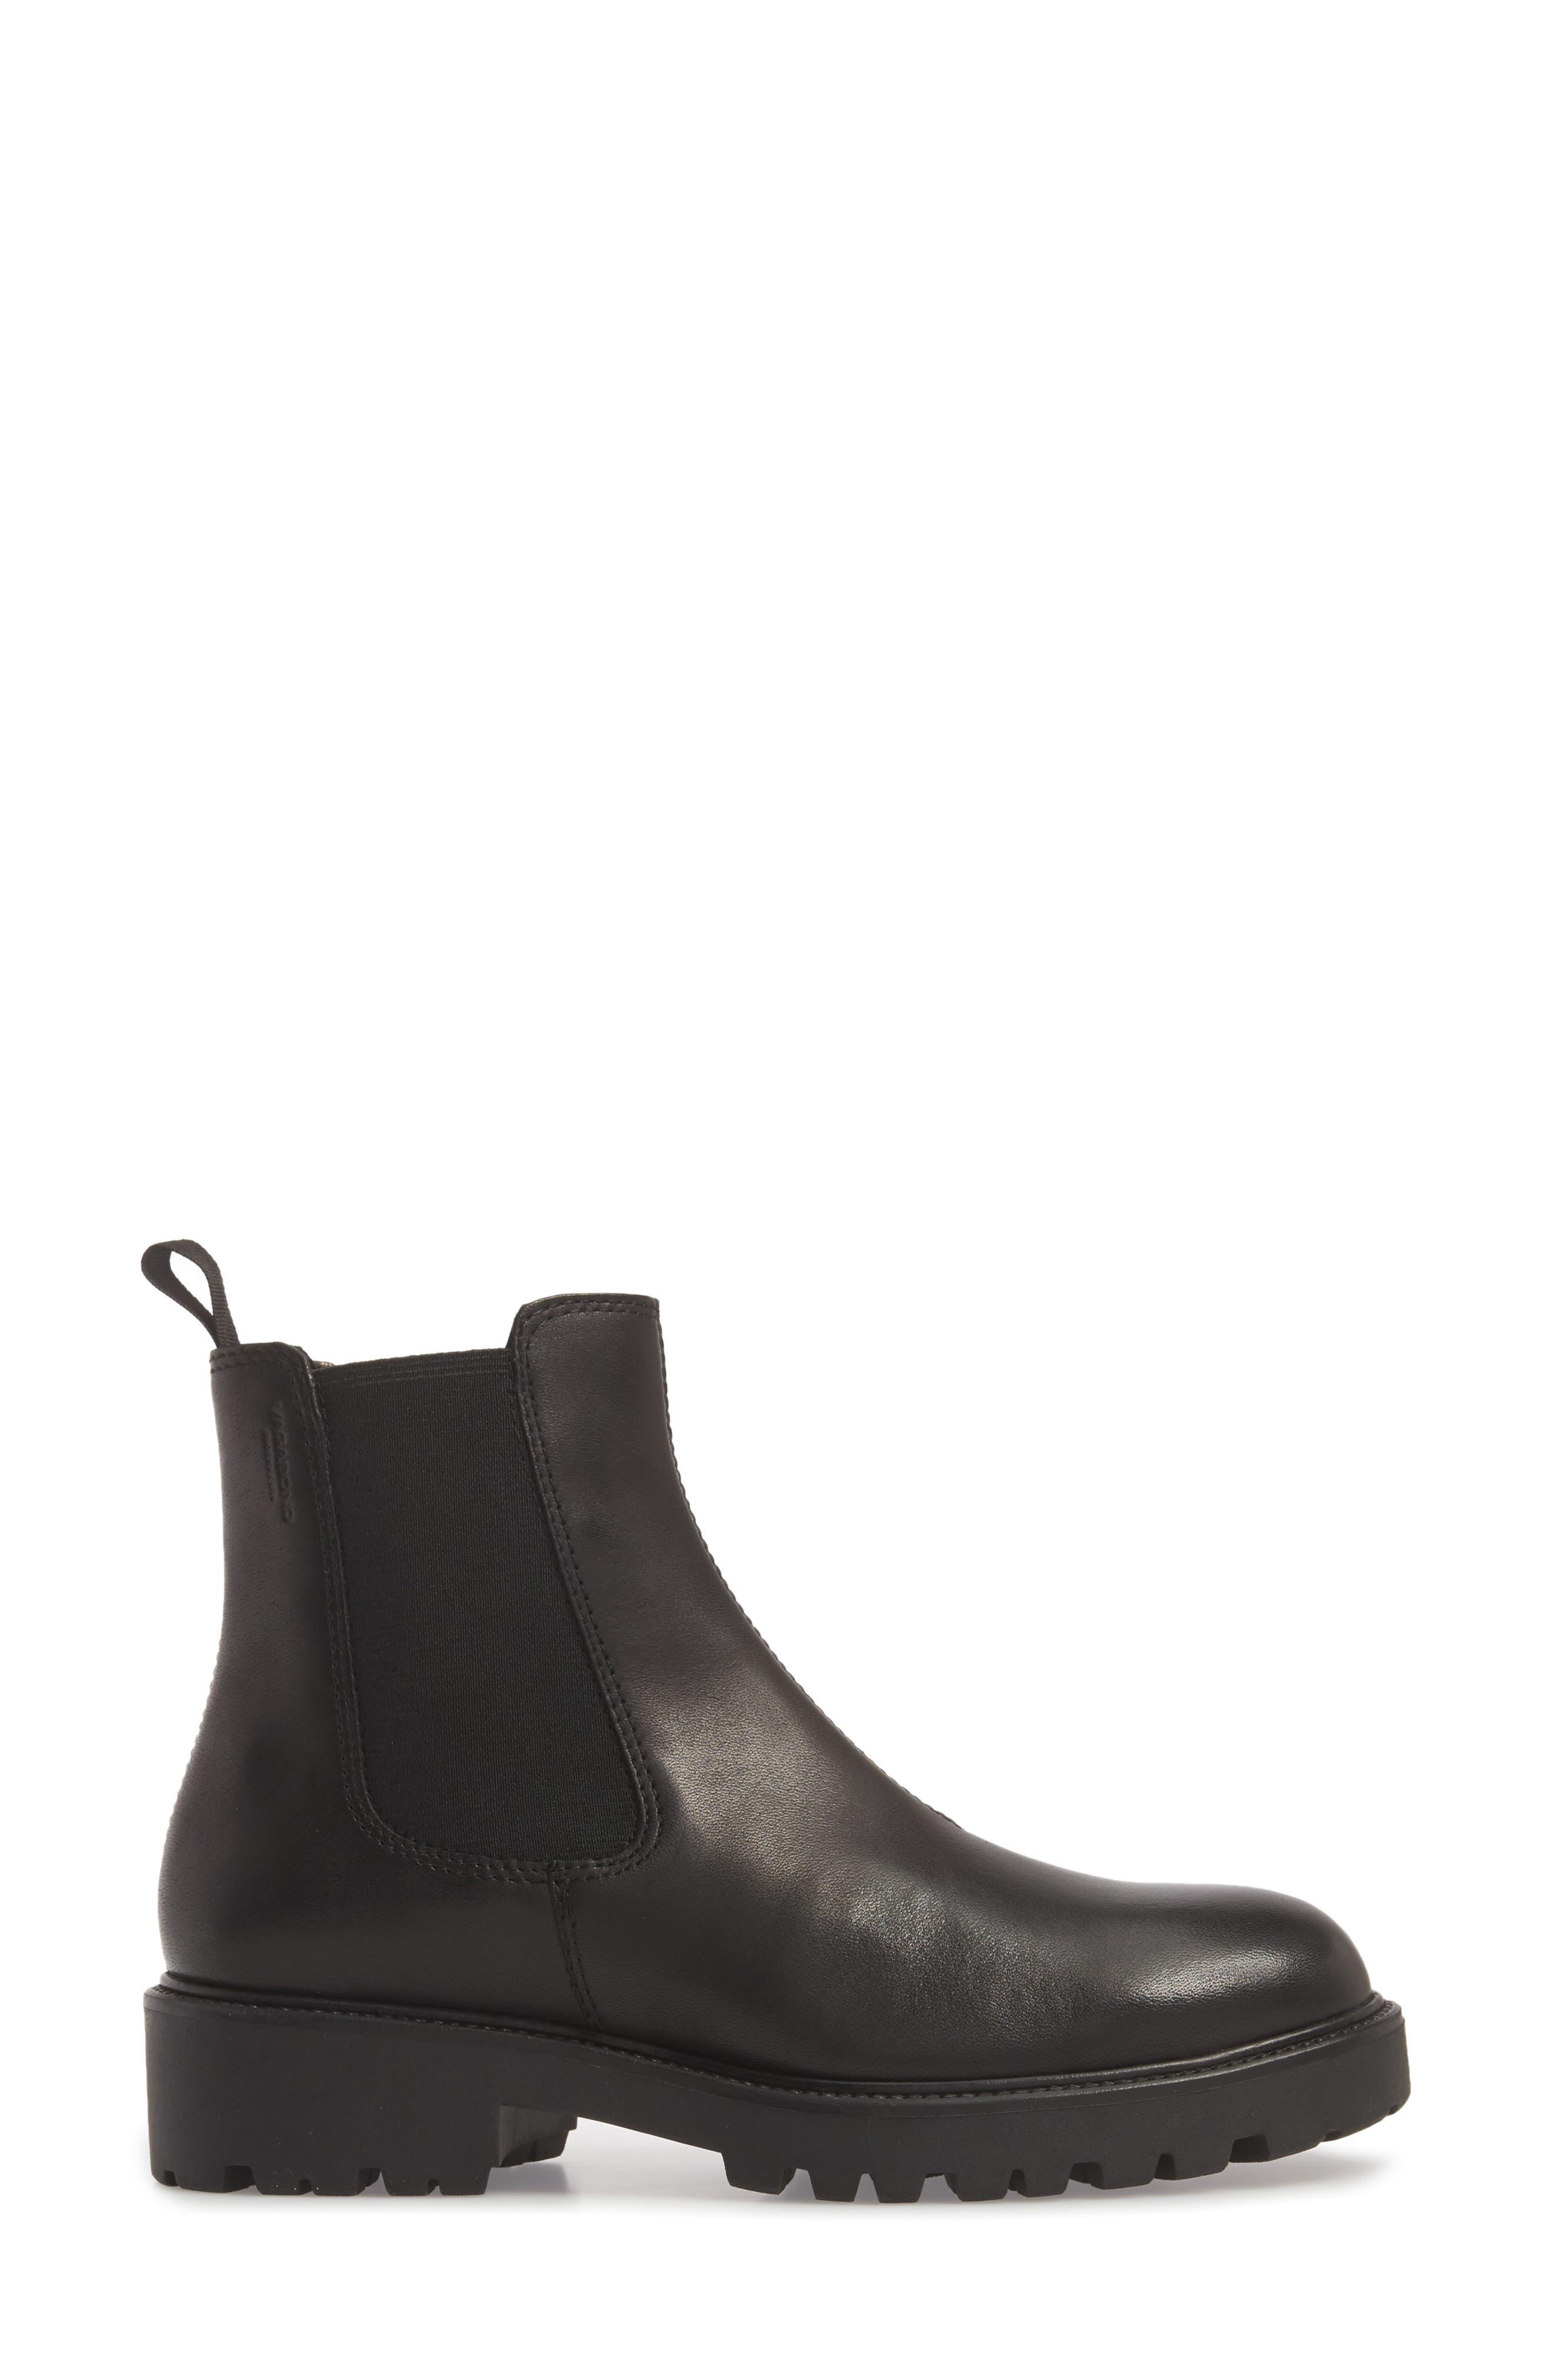 Kenova Lugged Chelsea Boot,                             Alternate thumbnail 3, color,                             BLACK LEATHER